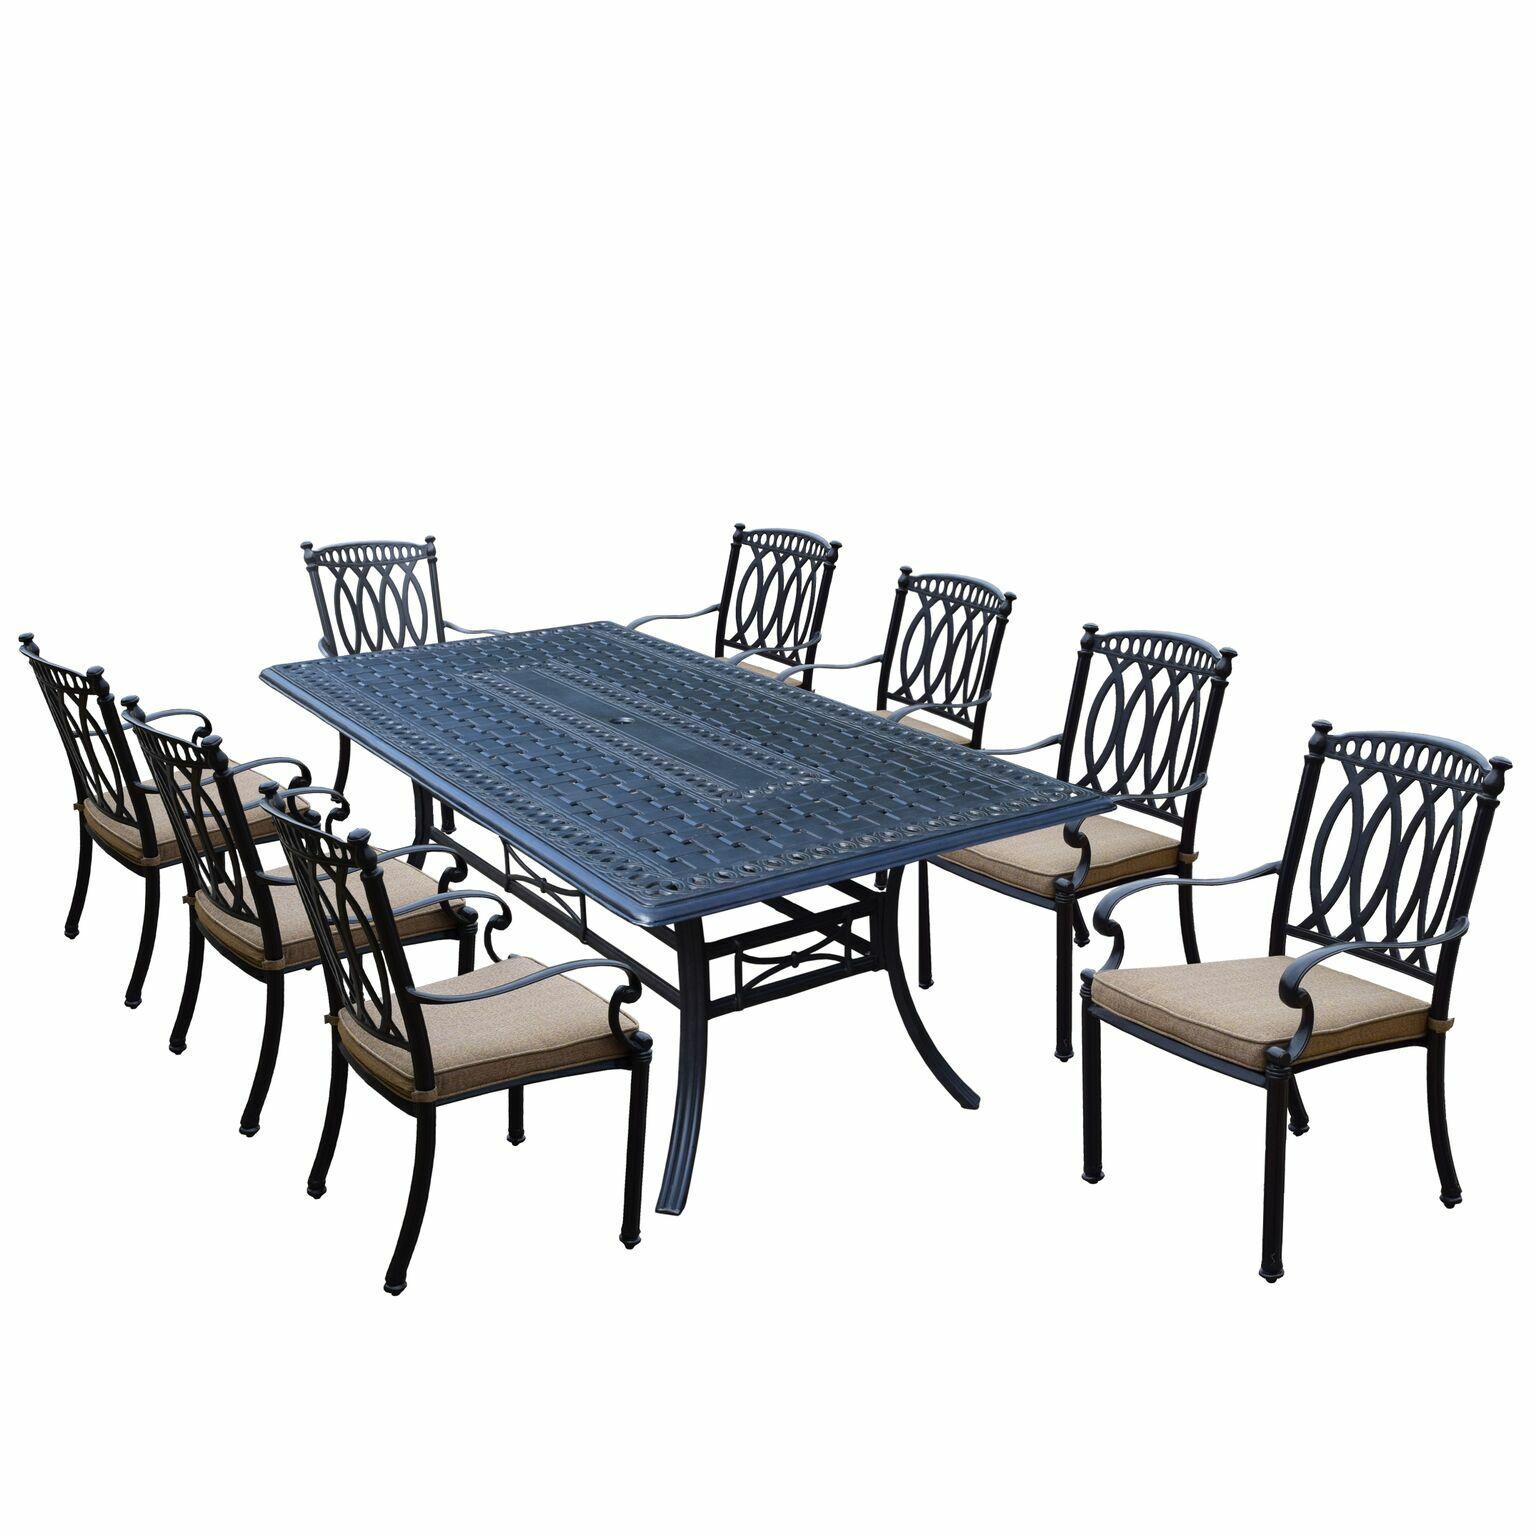 Otsego 9 Piece Aluminum Dining Set with Fabric Cushions